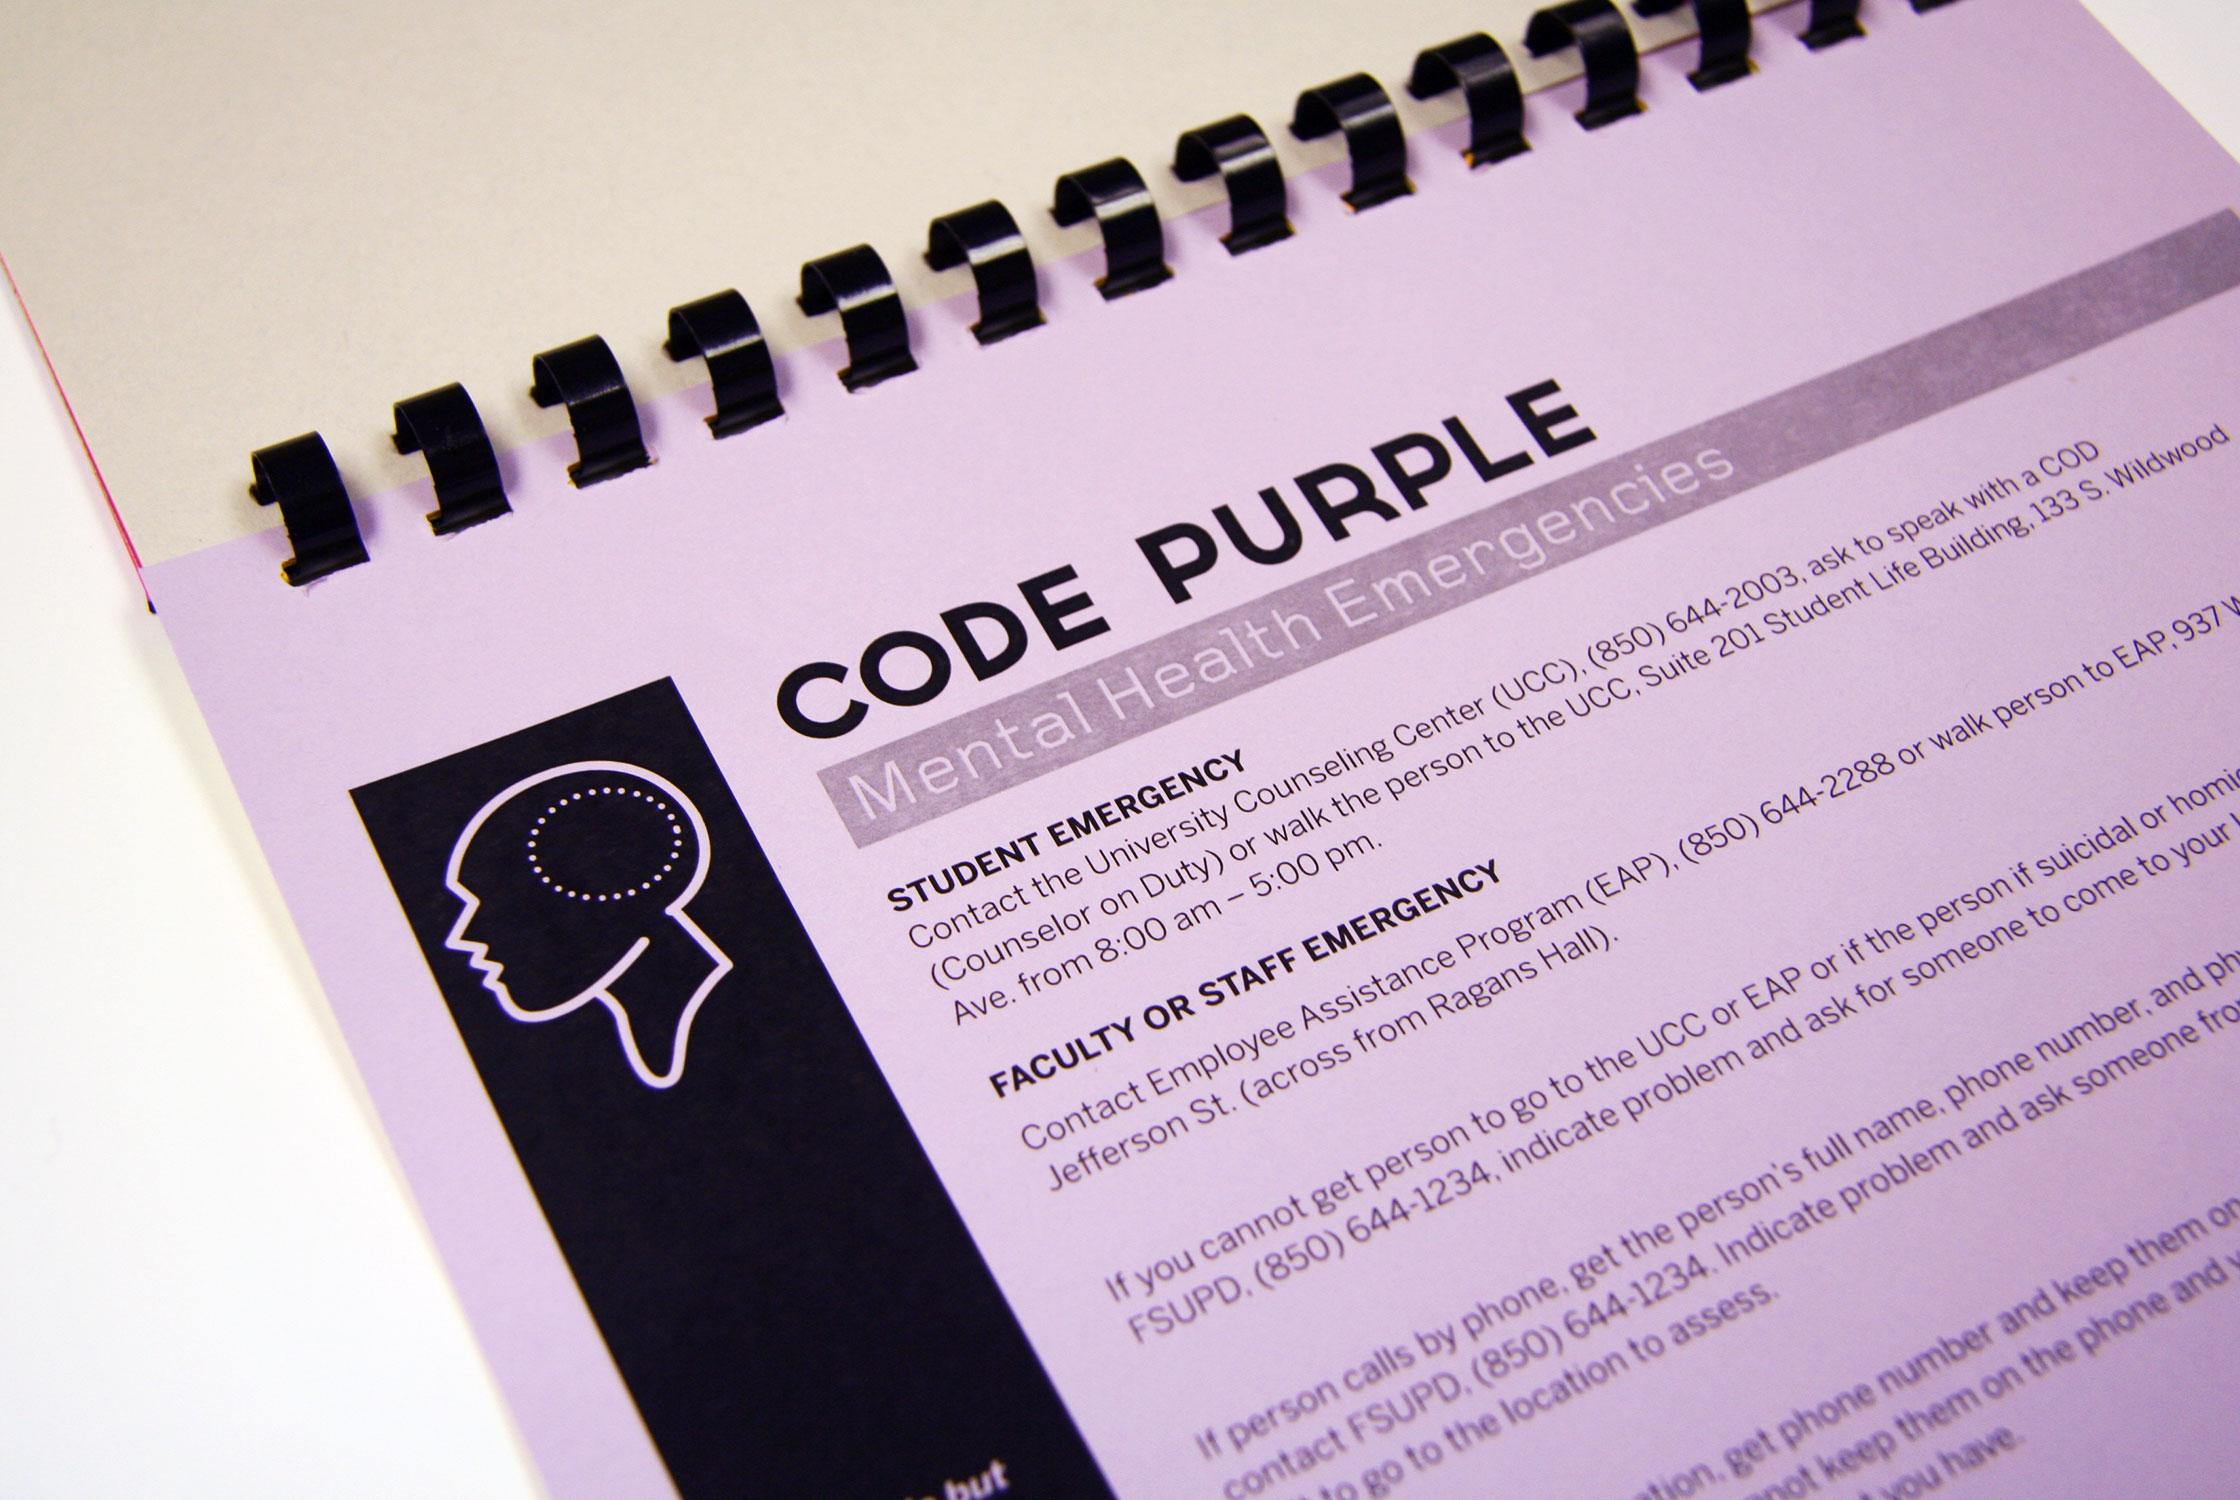 Website_Codebook05